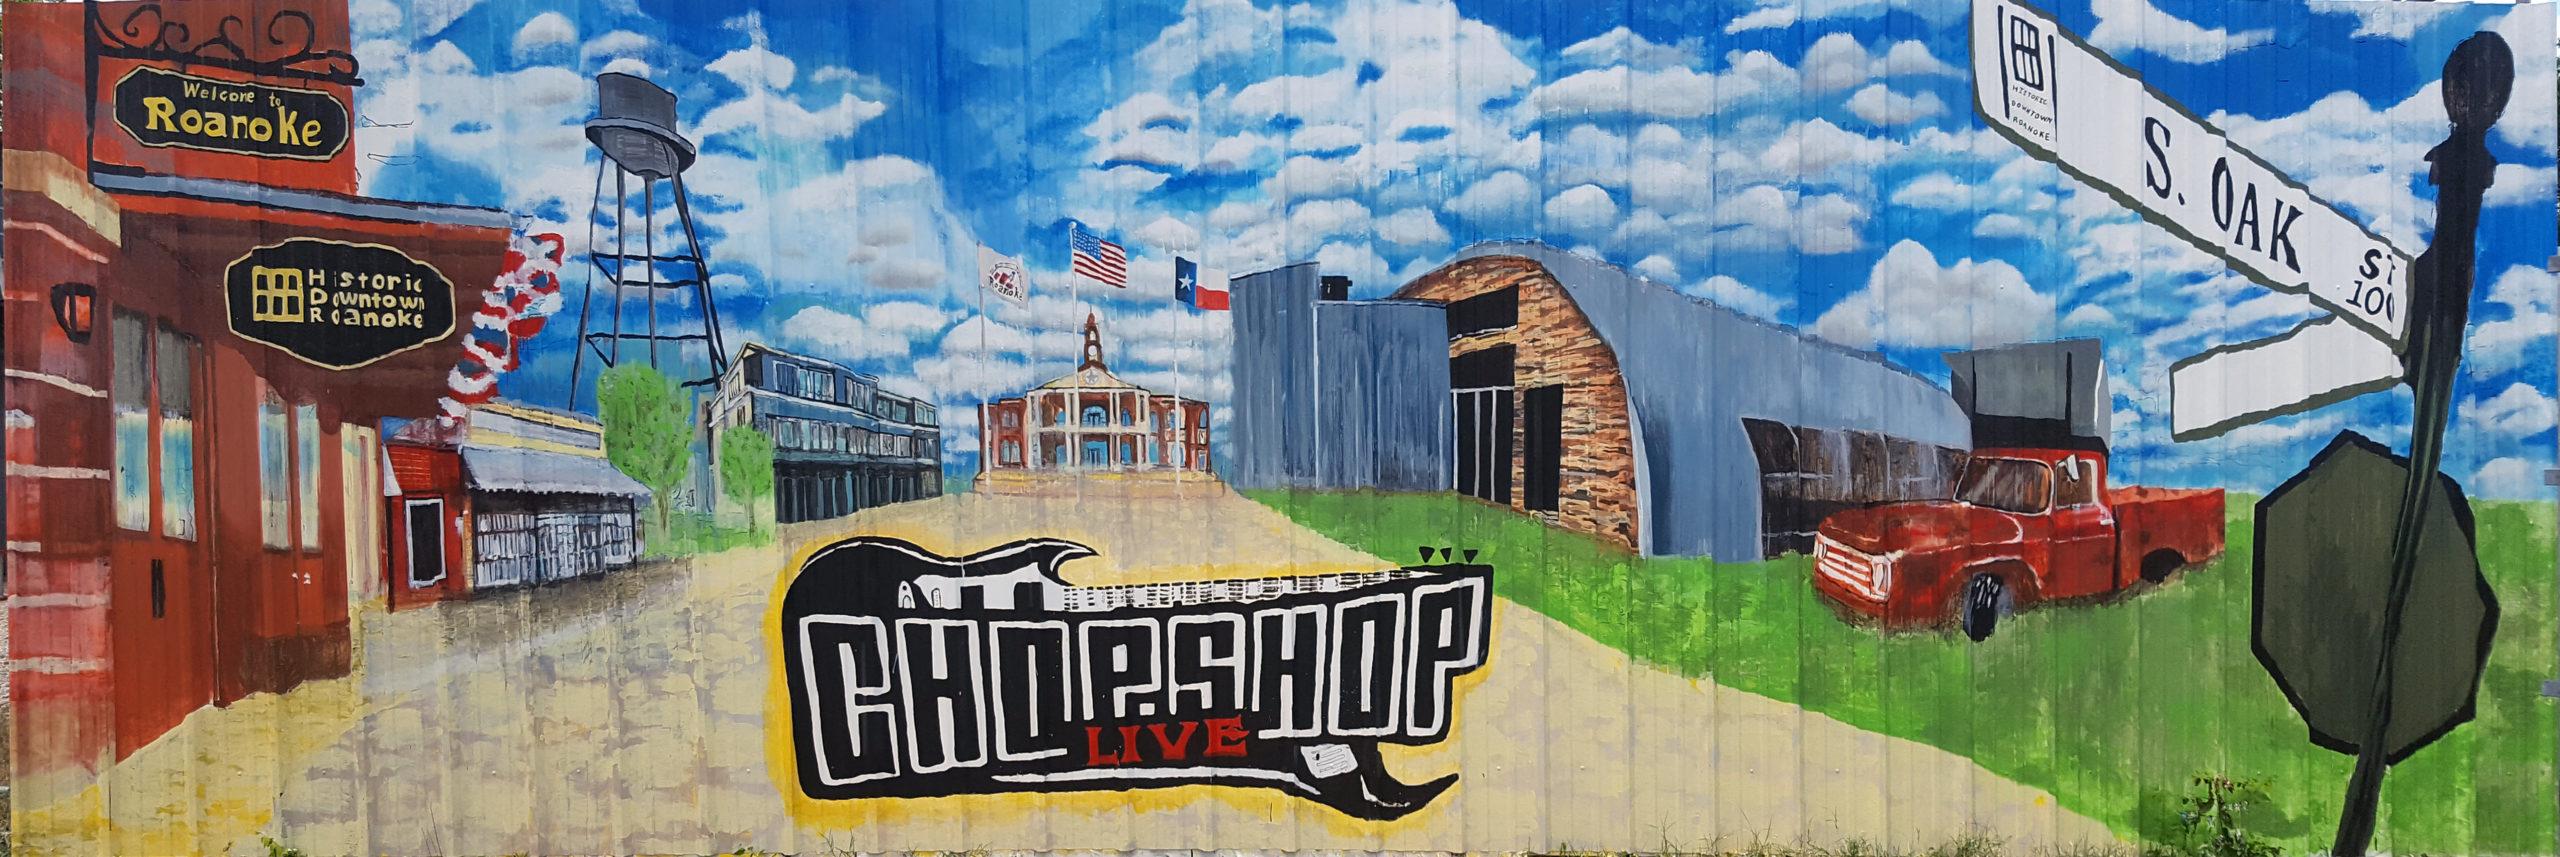 Chop Shop Mural Print